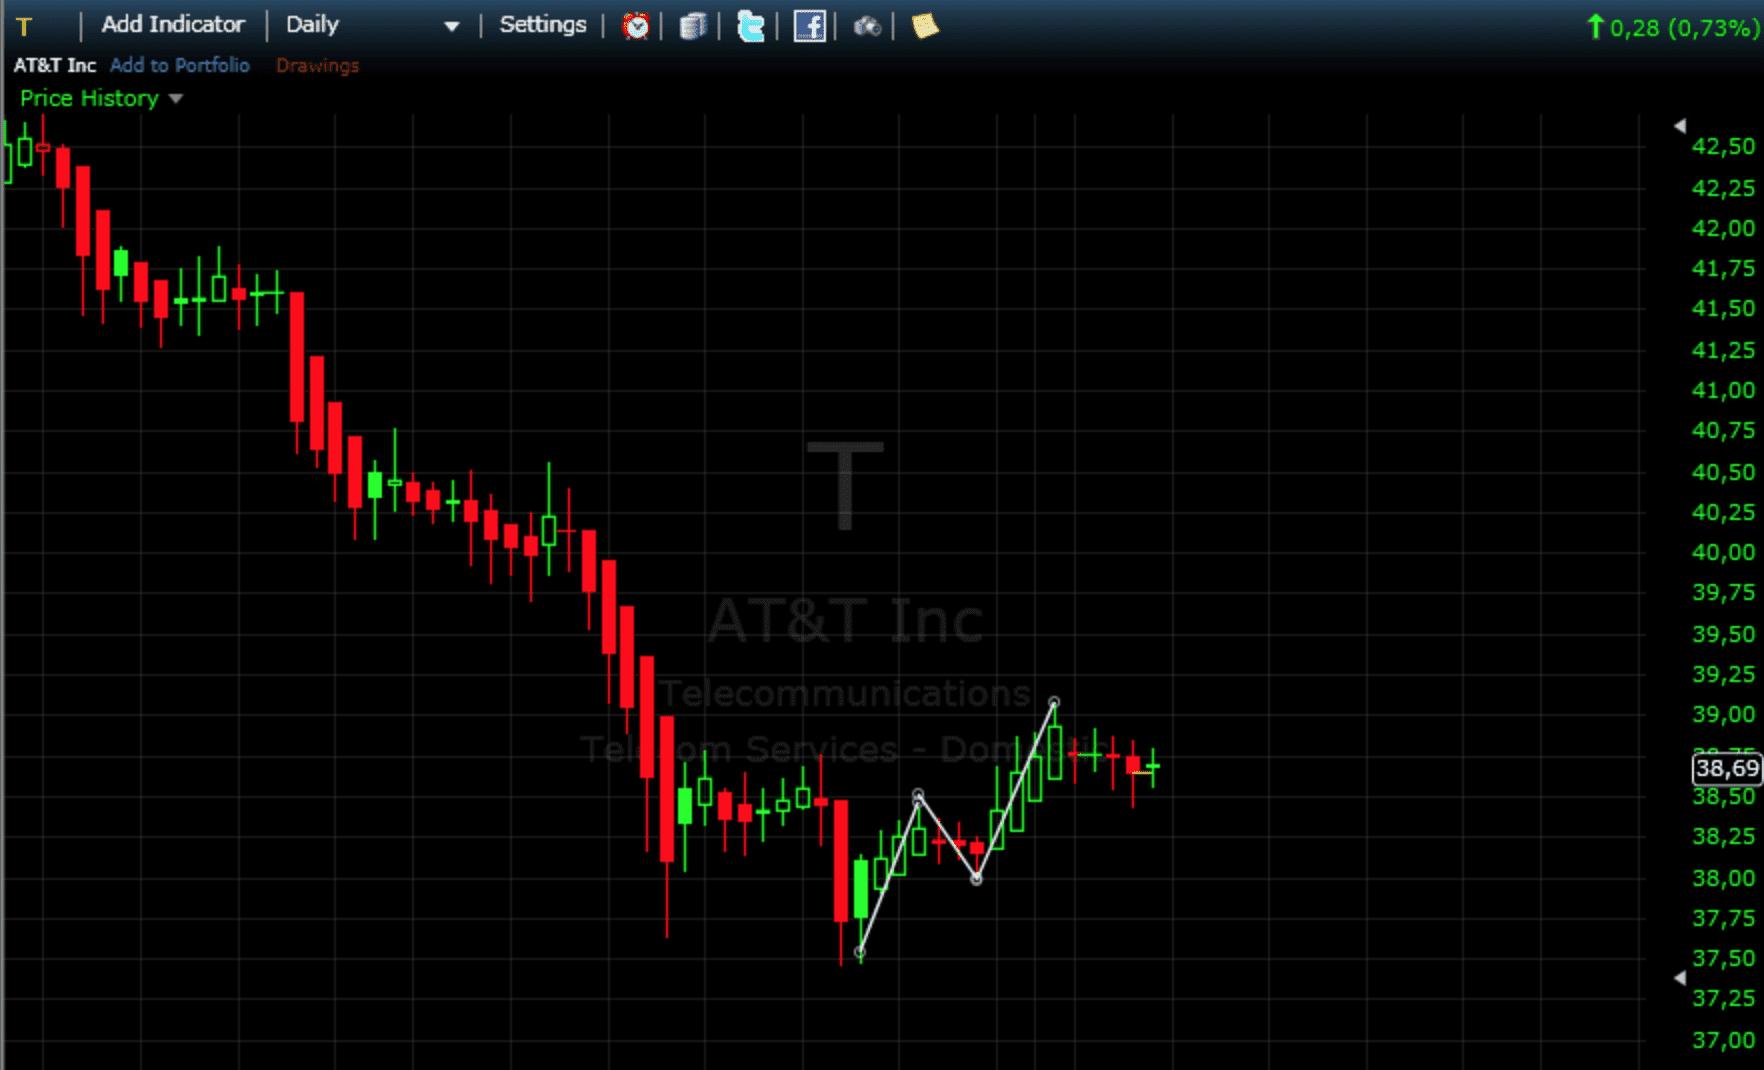 Top Edge-Aktien: AT&T